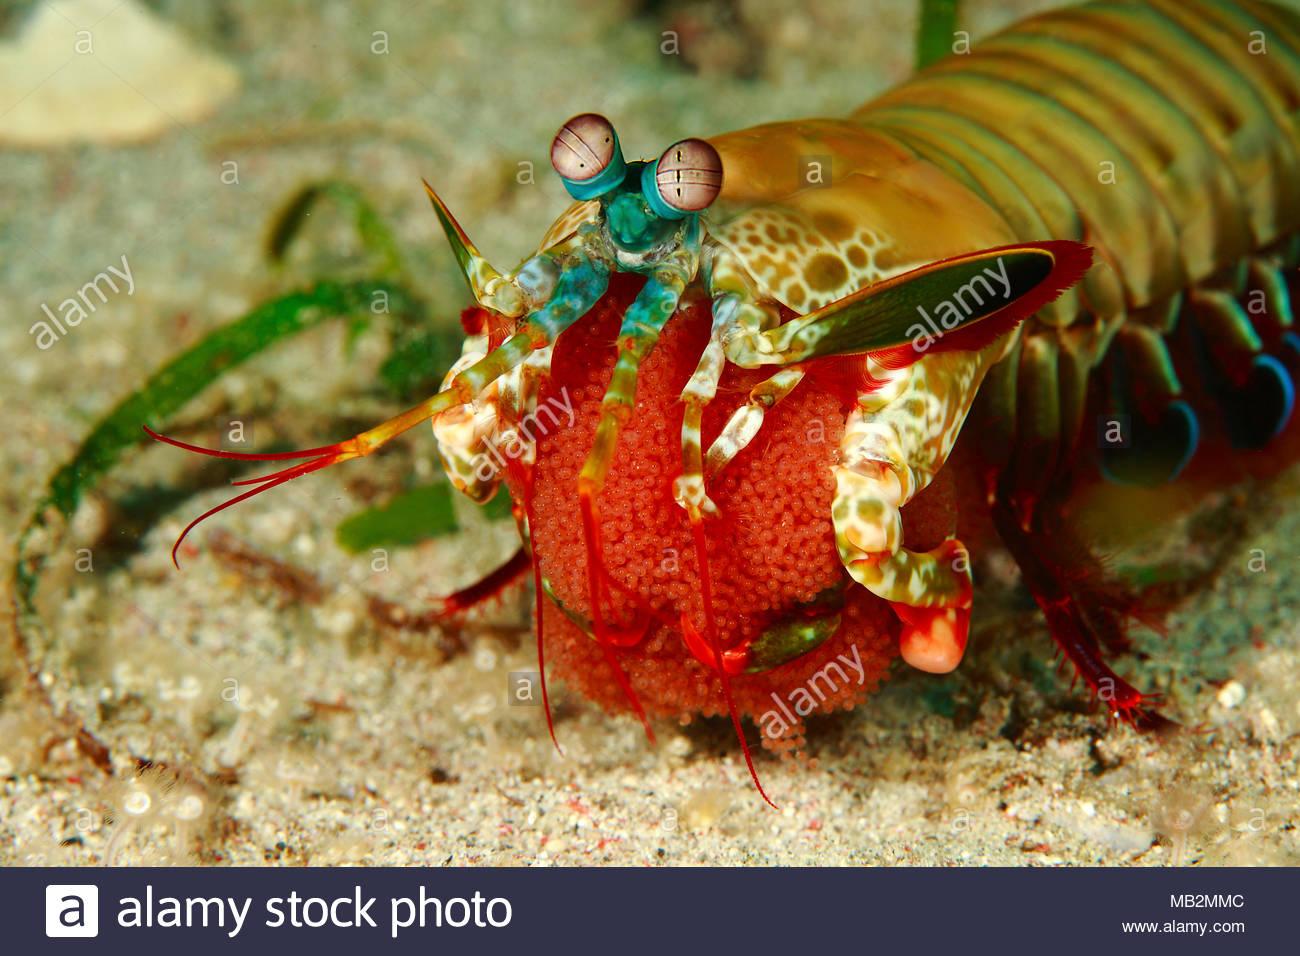 Clown mantis shrimp (Odontodactylus scyllarus) with eggs, Sabang beach, Mindoro, Philippines, Asia - Stock Image